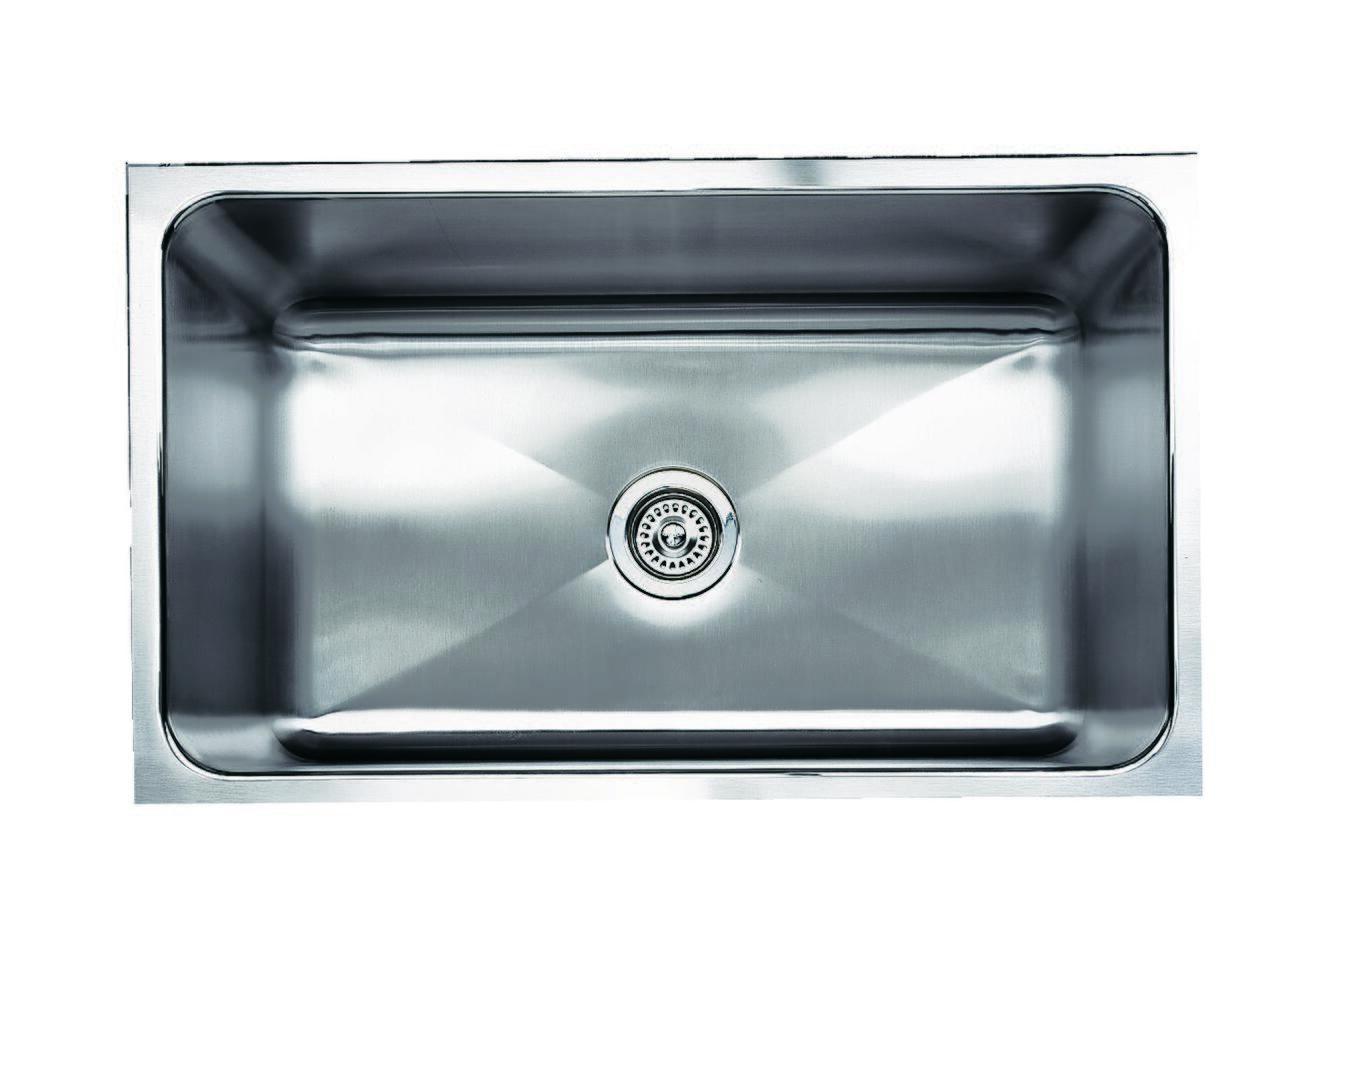 Blanco 440300 Kitchen Sink   Appliances Connection